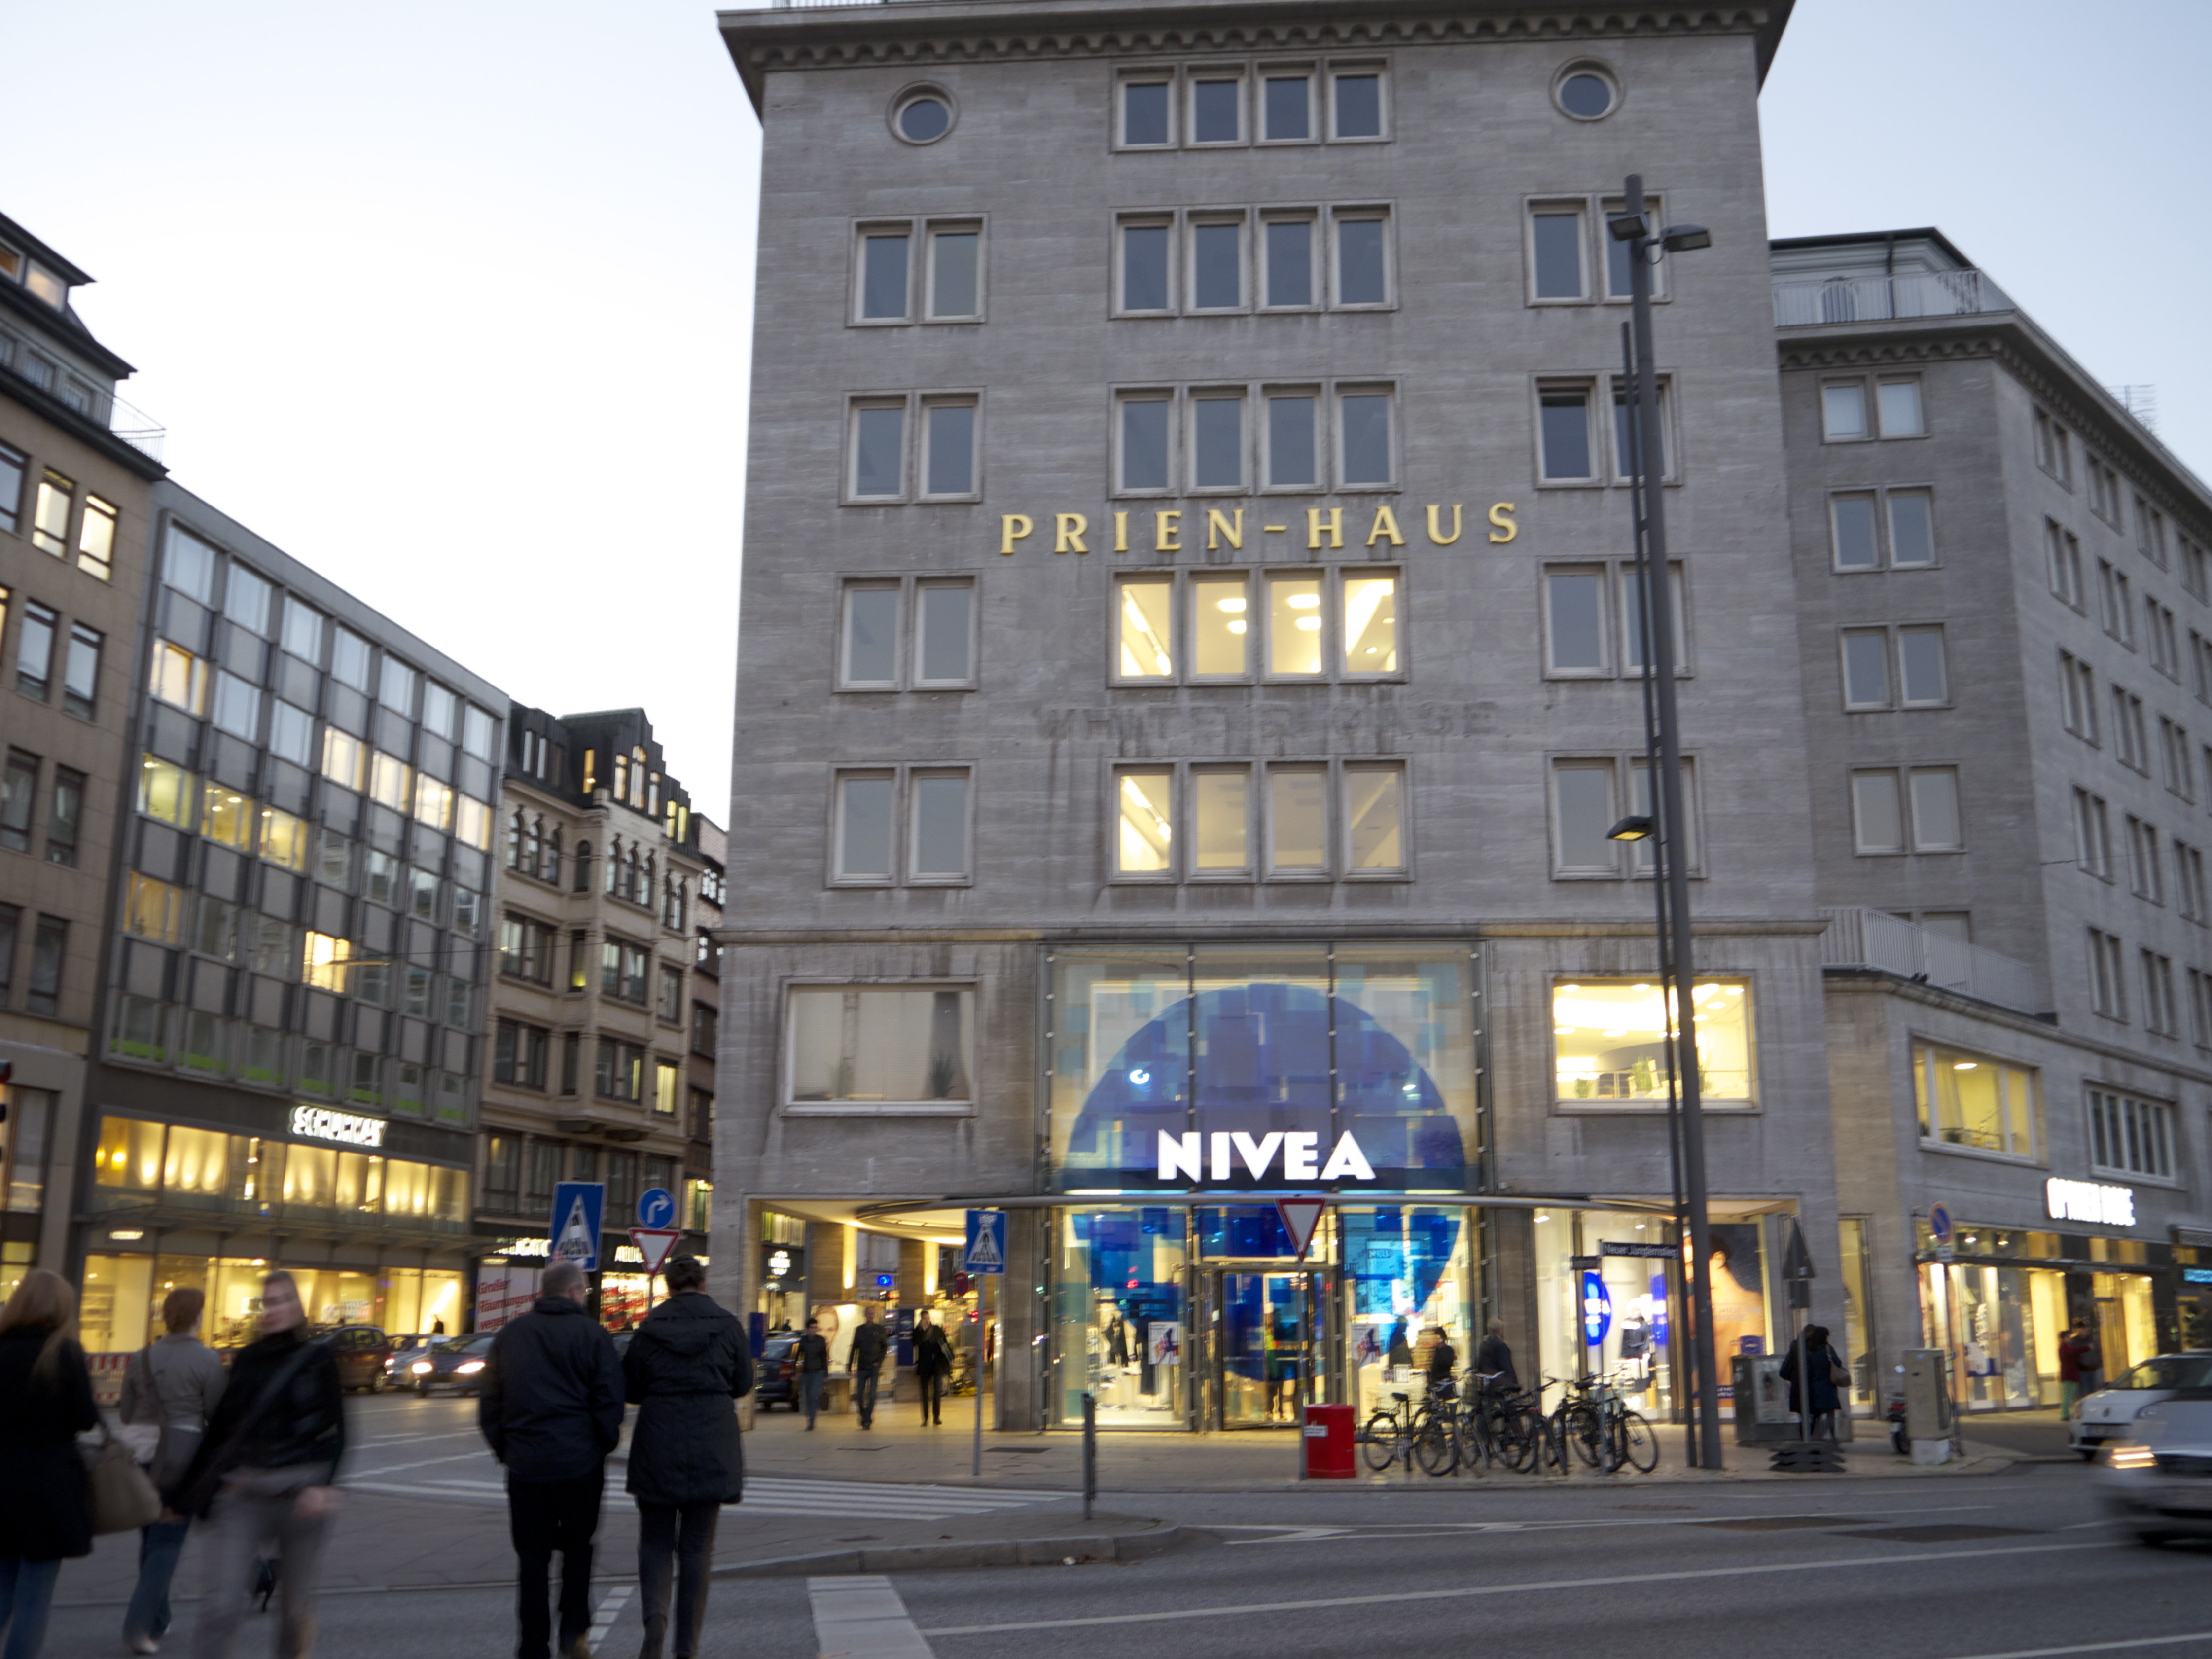 Express Entspannung Im Nivea Haus in Hamburg